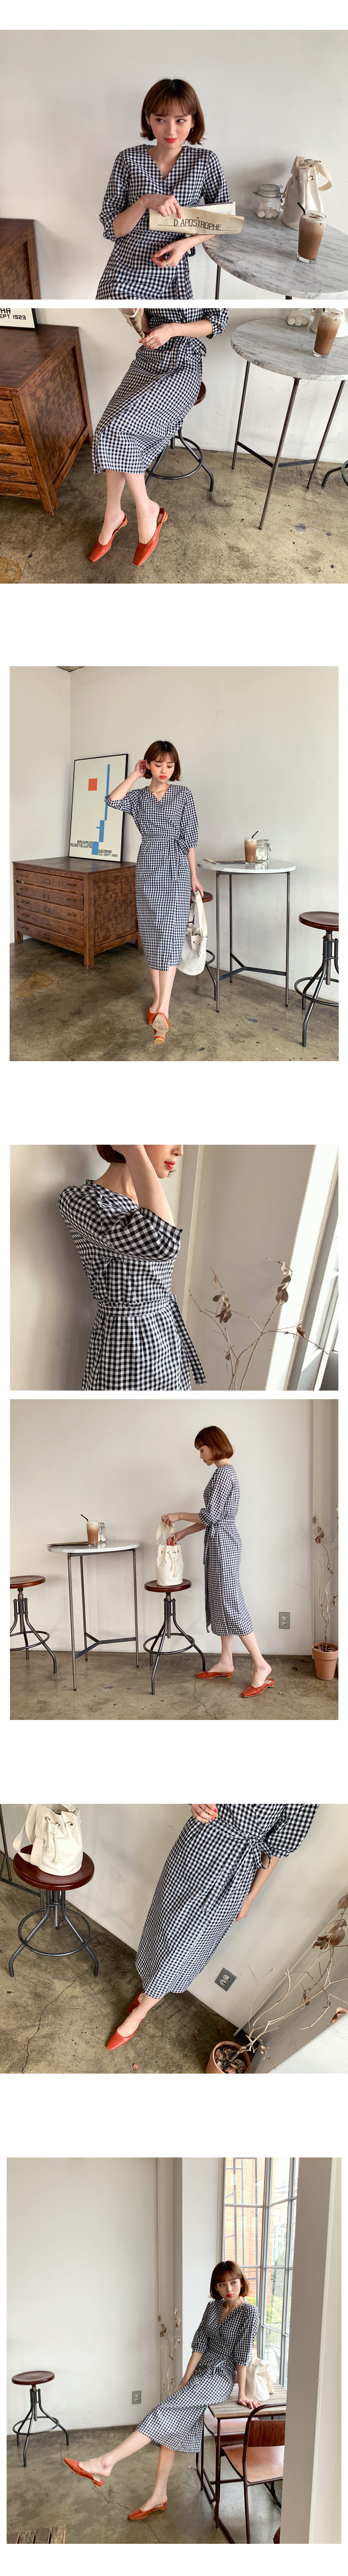 e4b7205361c21 ラップギンガムチェックワンピース・全3色ドレス・ワンピ